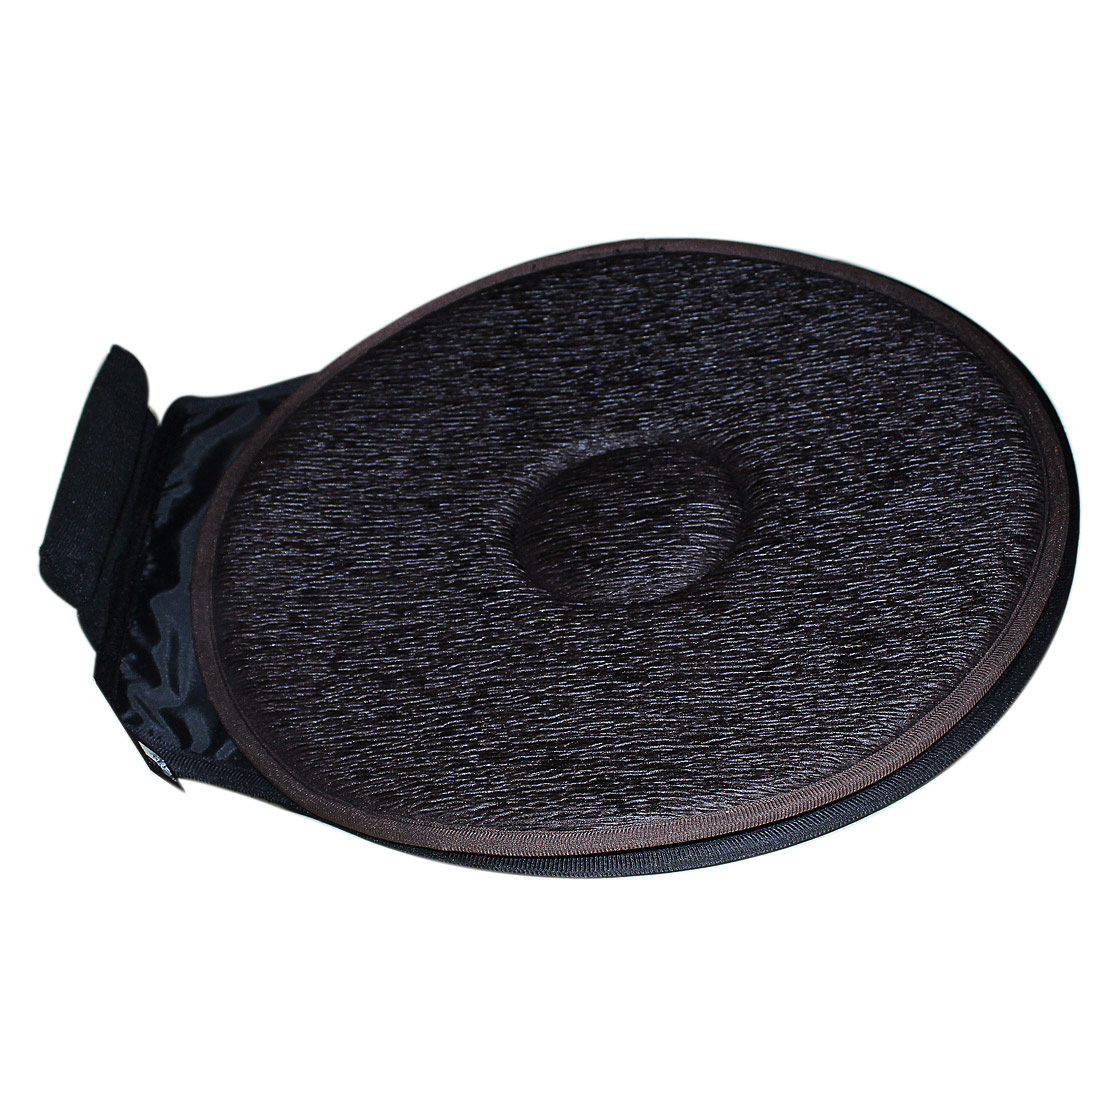 revolving chair repair in jaipur reclining high car seat rotating cushion swivel foam mobility